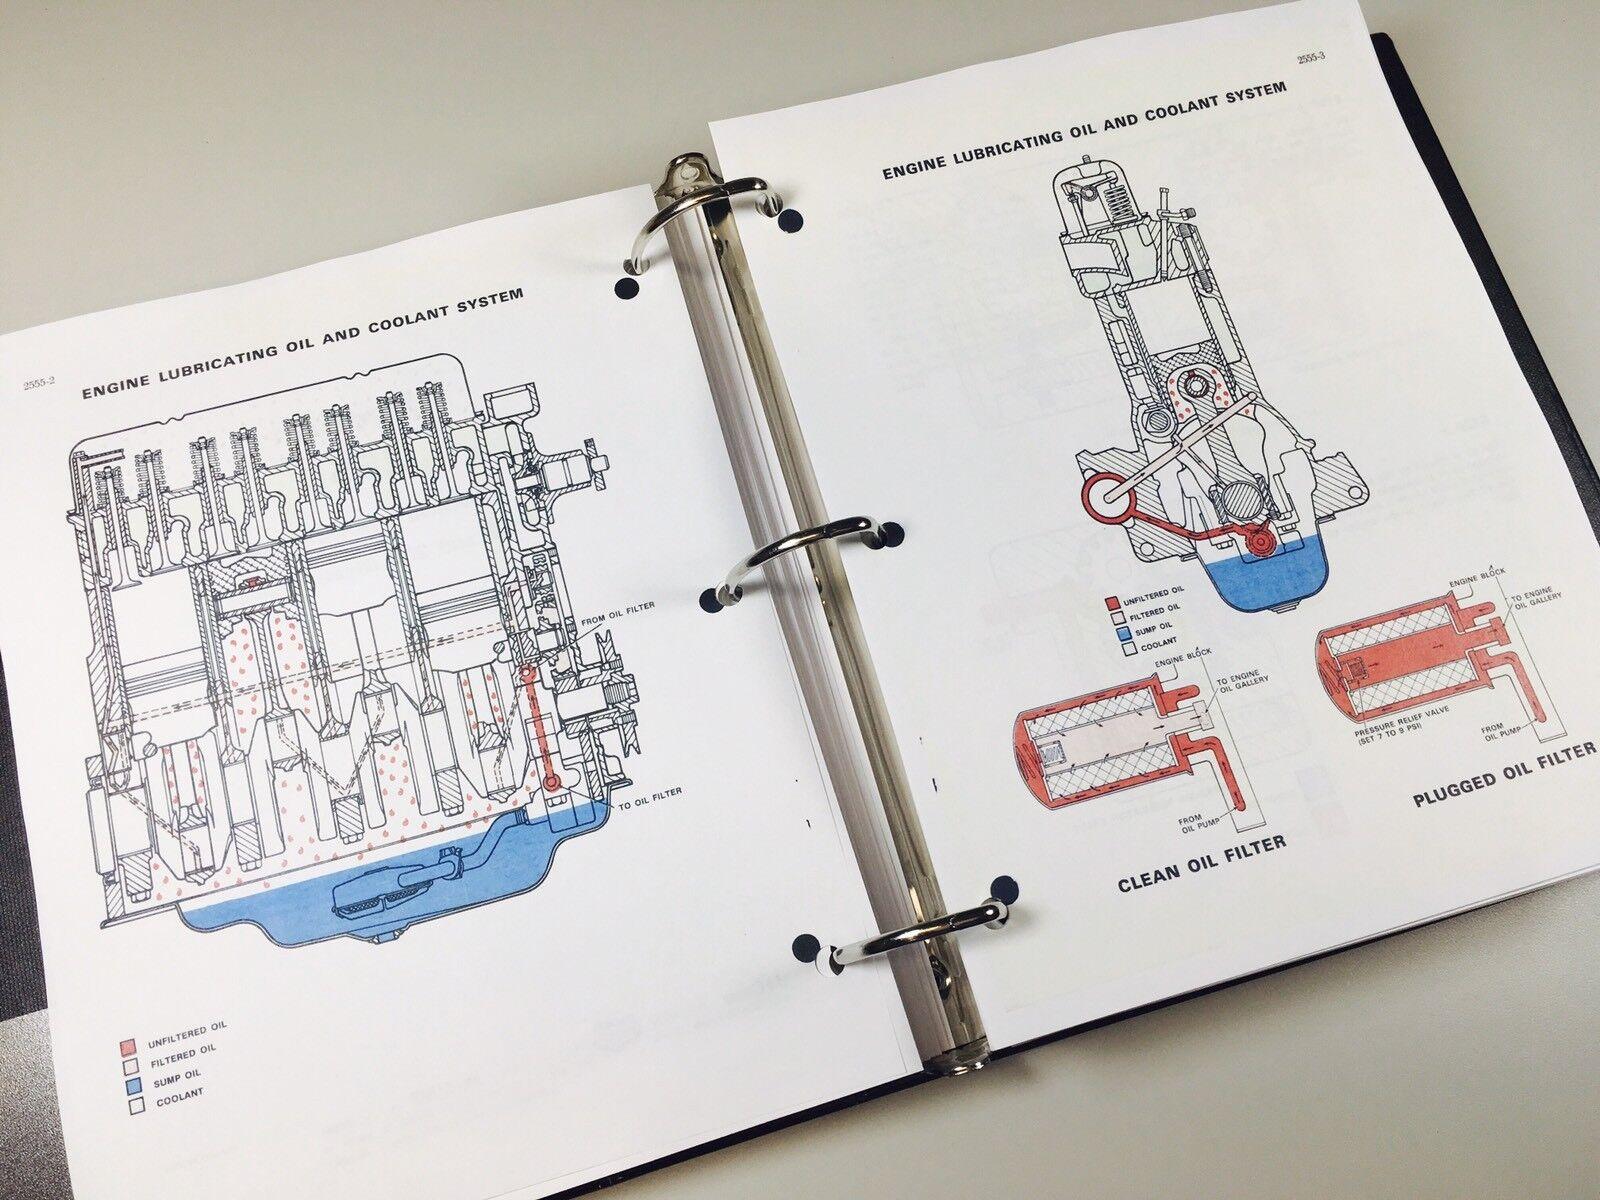 case 580 wiring diagram, case planter wiring diagram, case loader fuel  tank, case